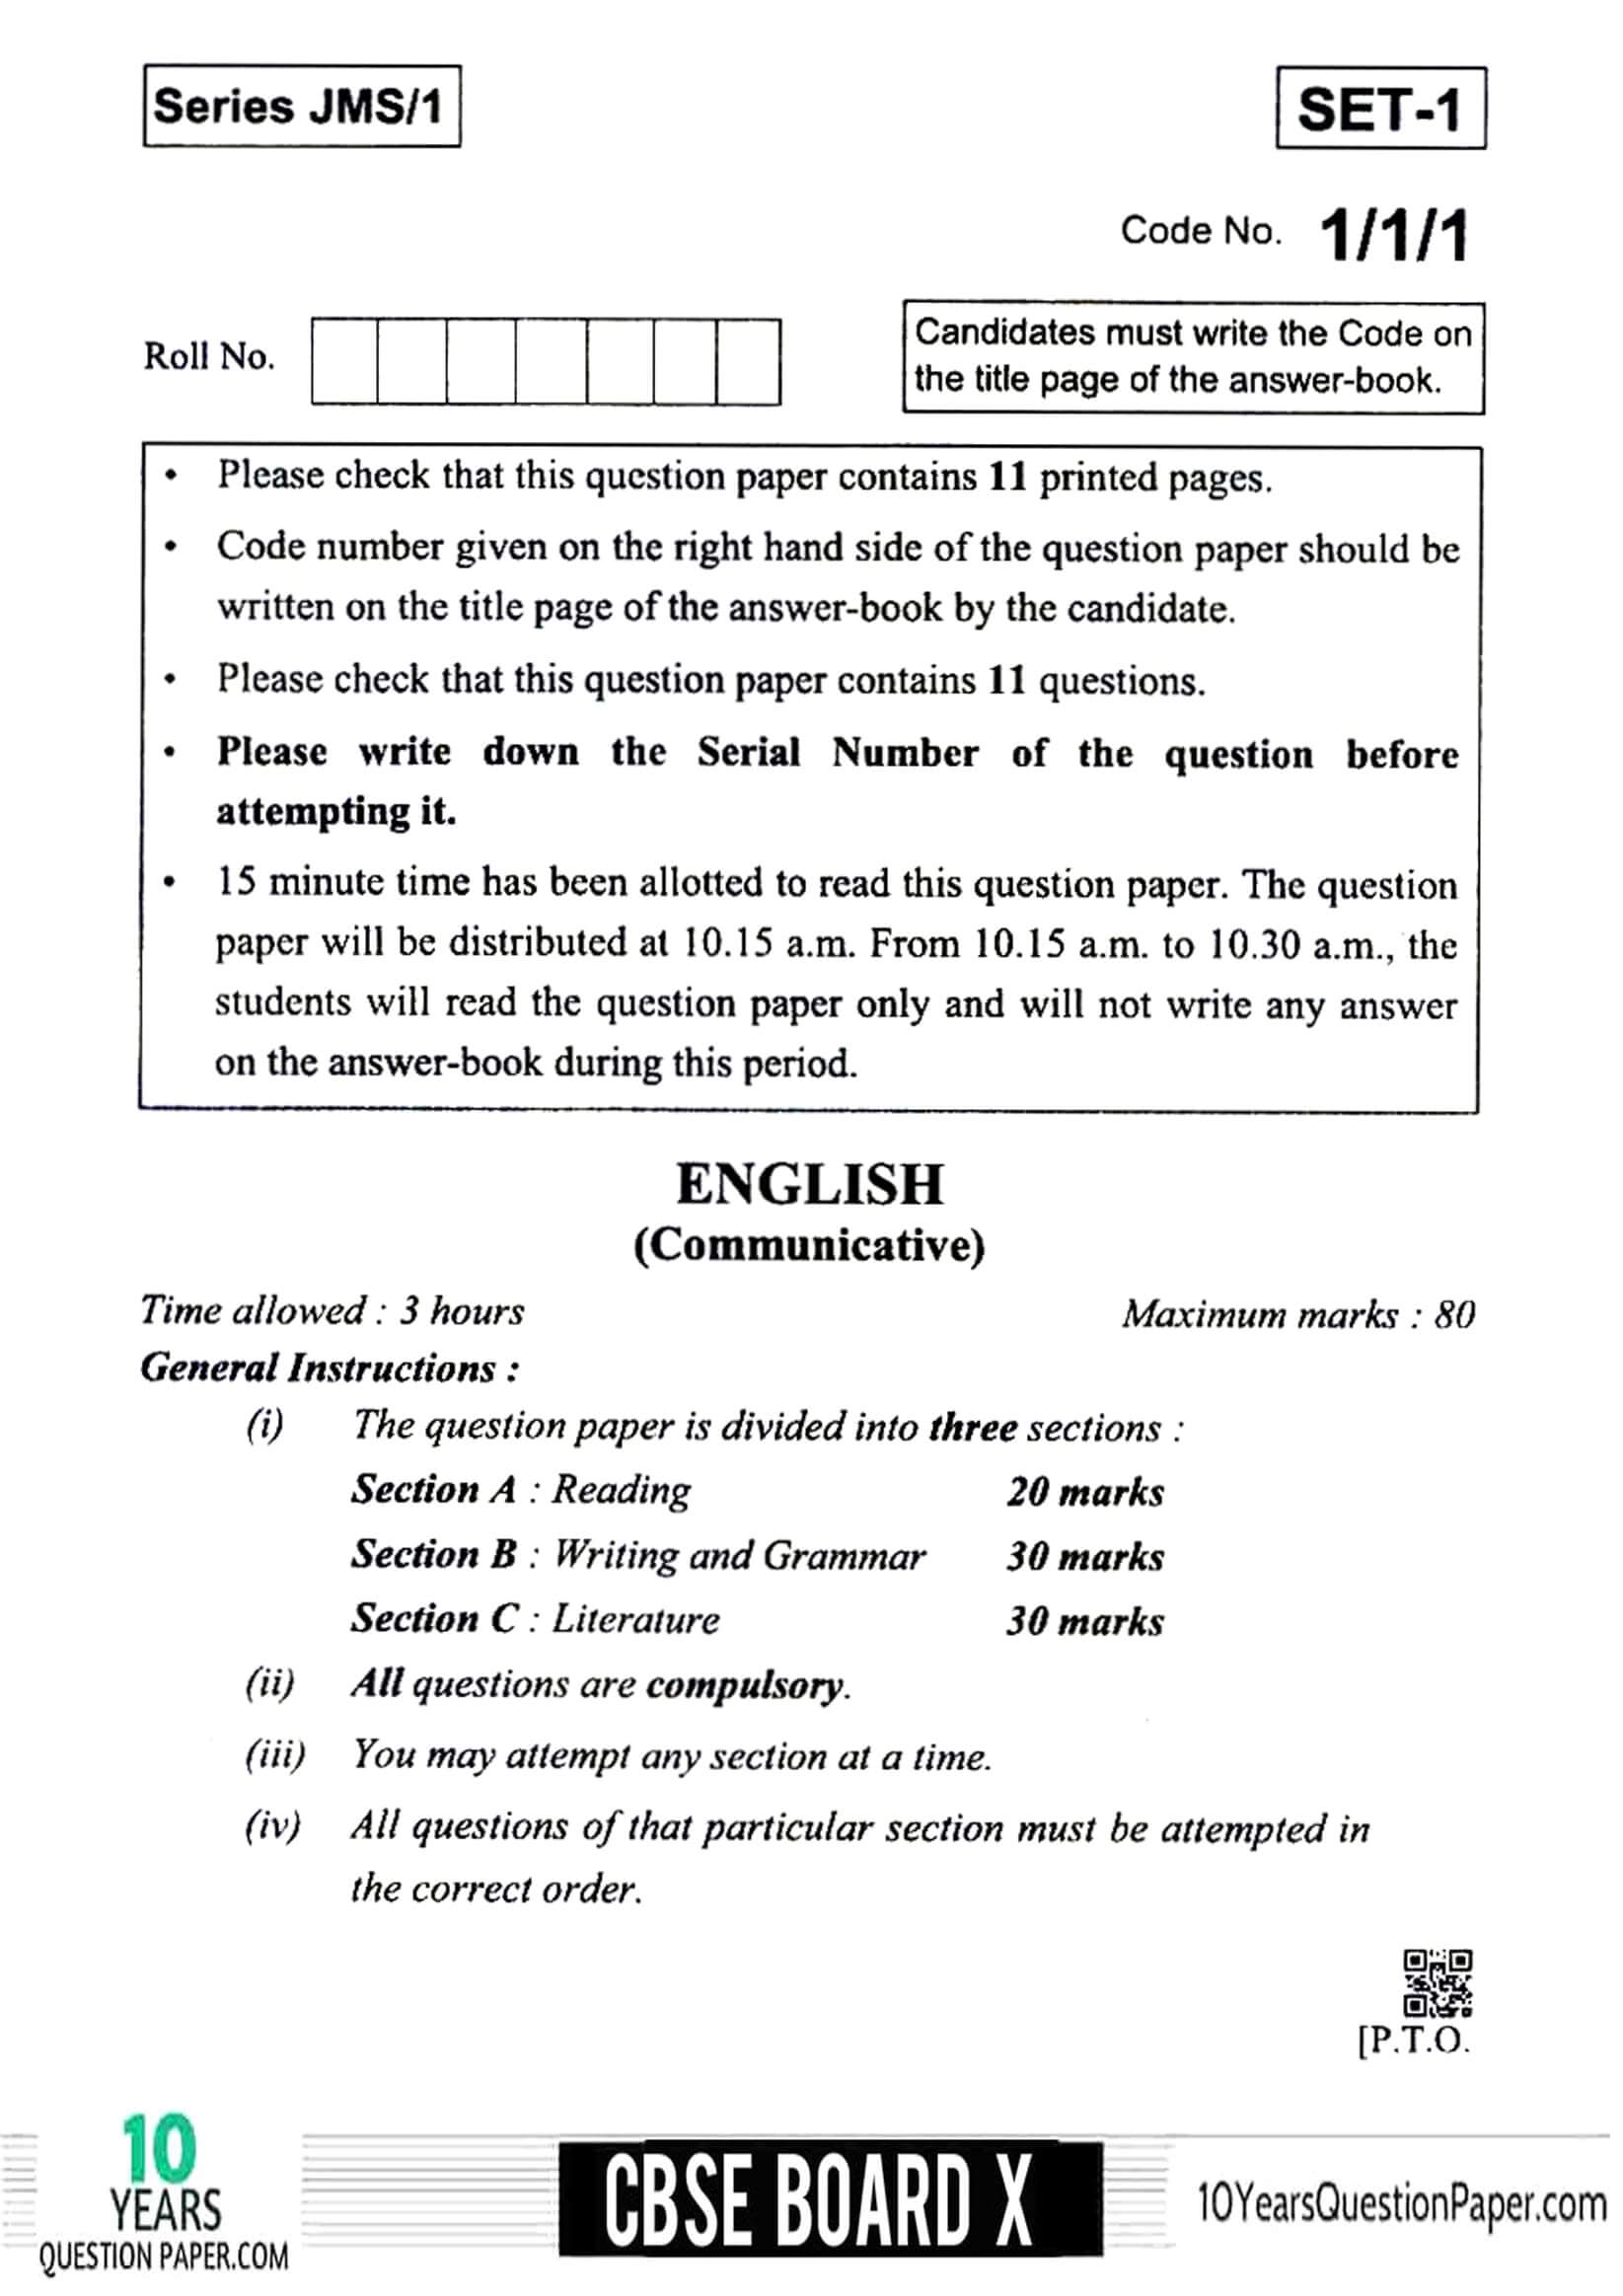 CBSE Class 10 English Communicative 2019 Question Paper